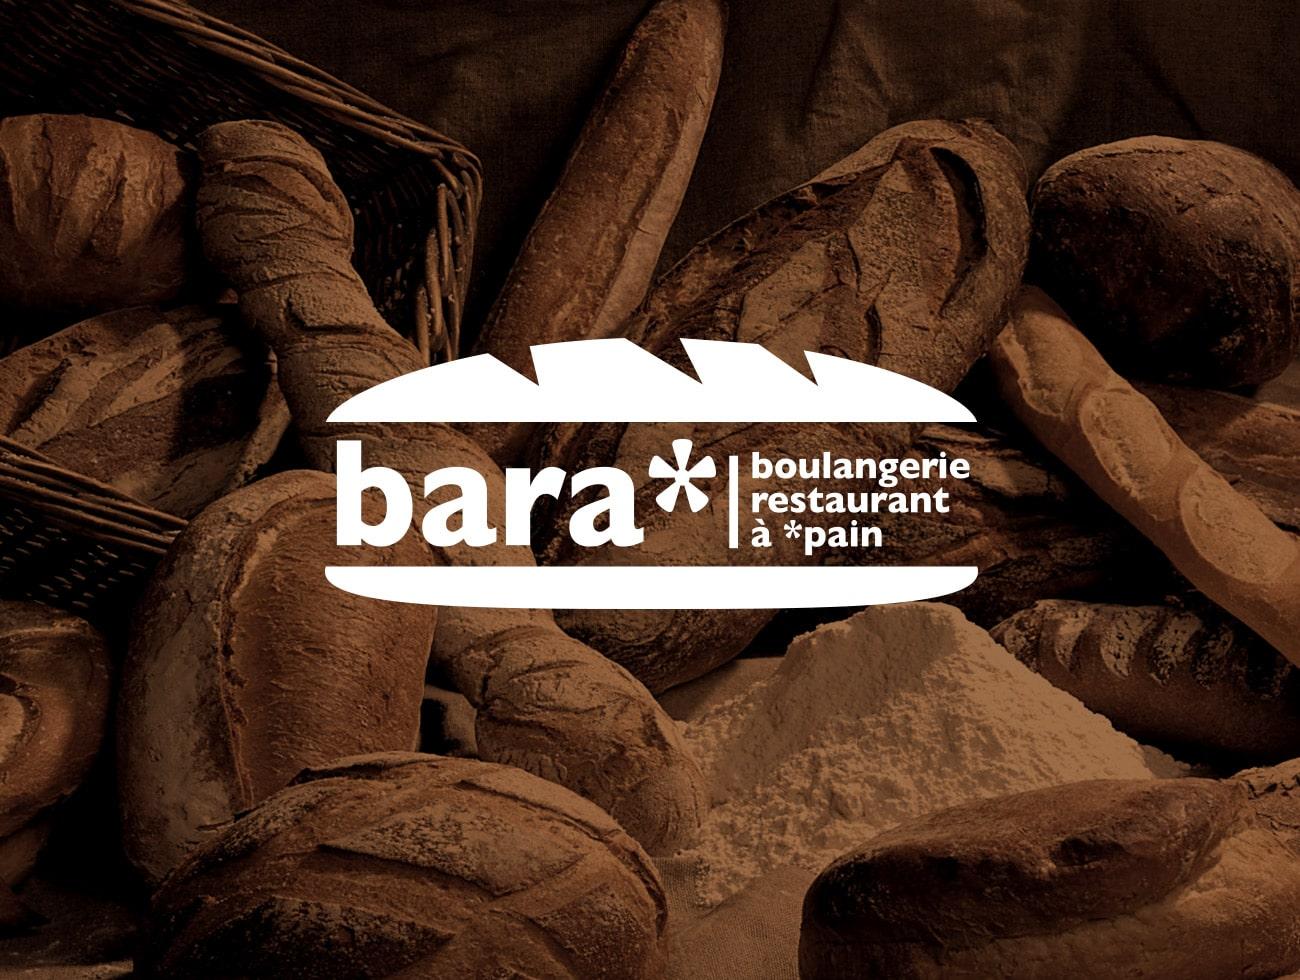 1-bara-boulangerie-positionnement-identite-visuelle-marketing-communication-bretagne-lorient